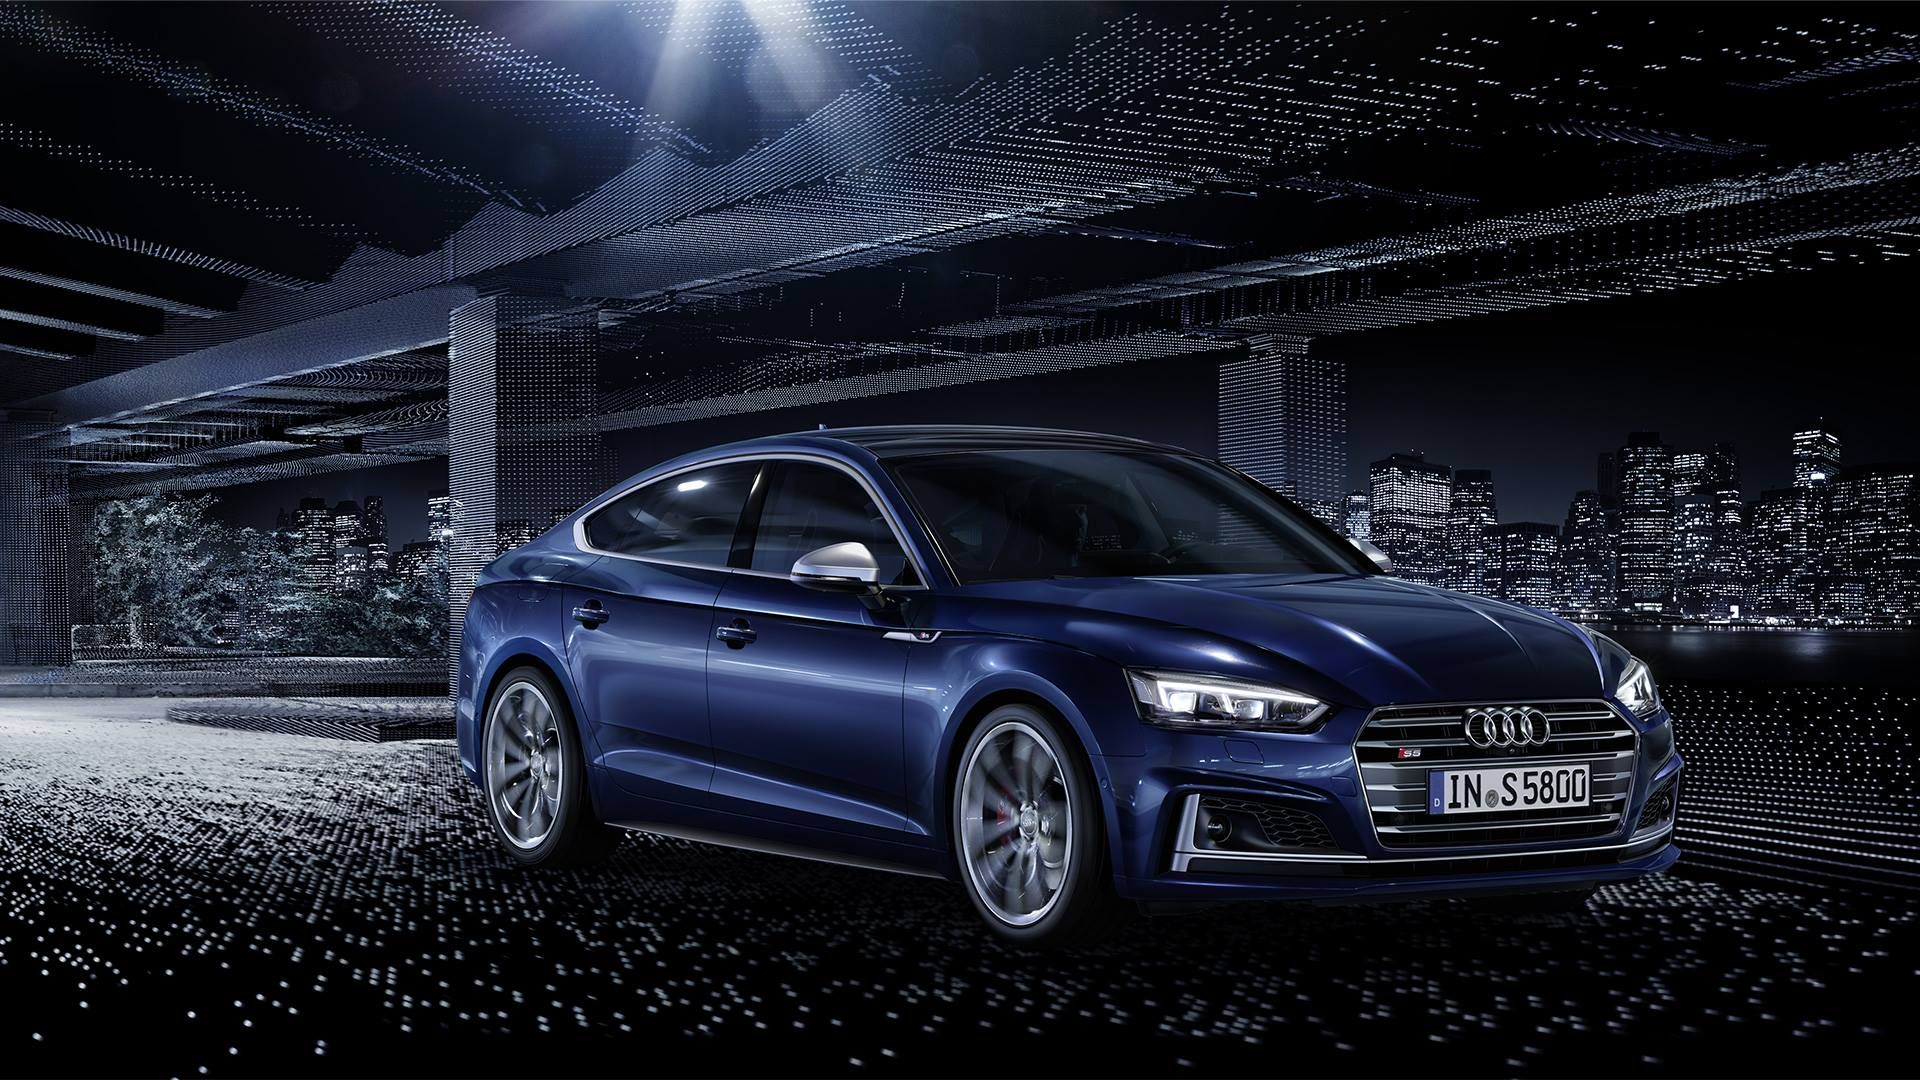 Navarra Blue Audi S5 Sportback Fun Audi Audi S5 Audi S5 Sportback